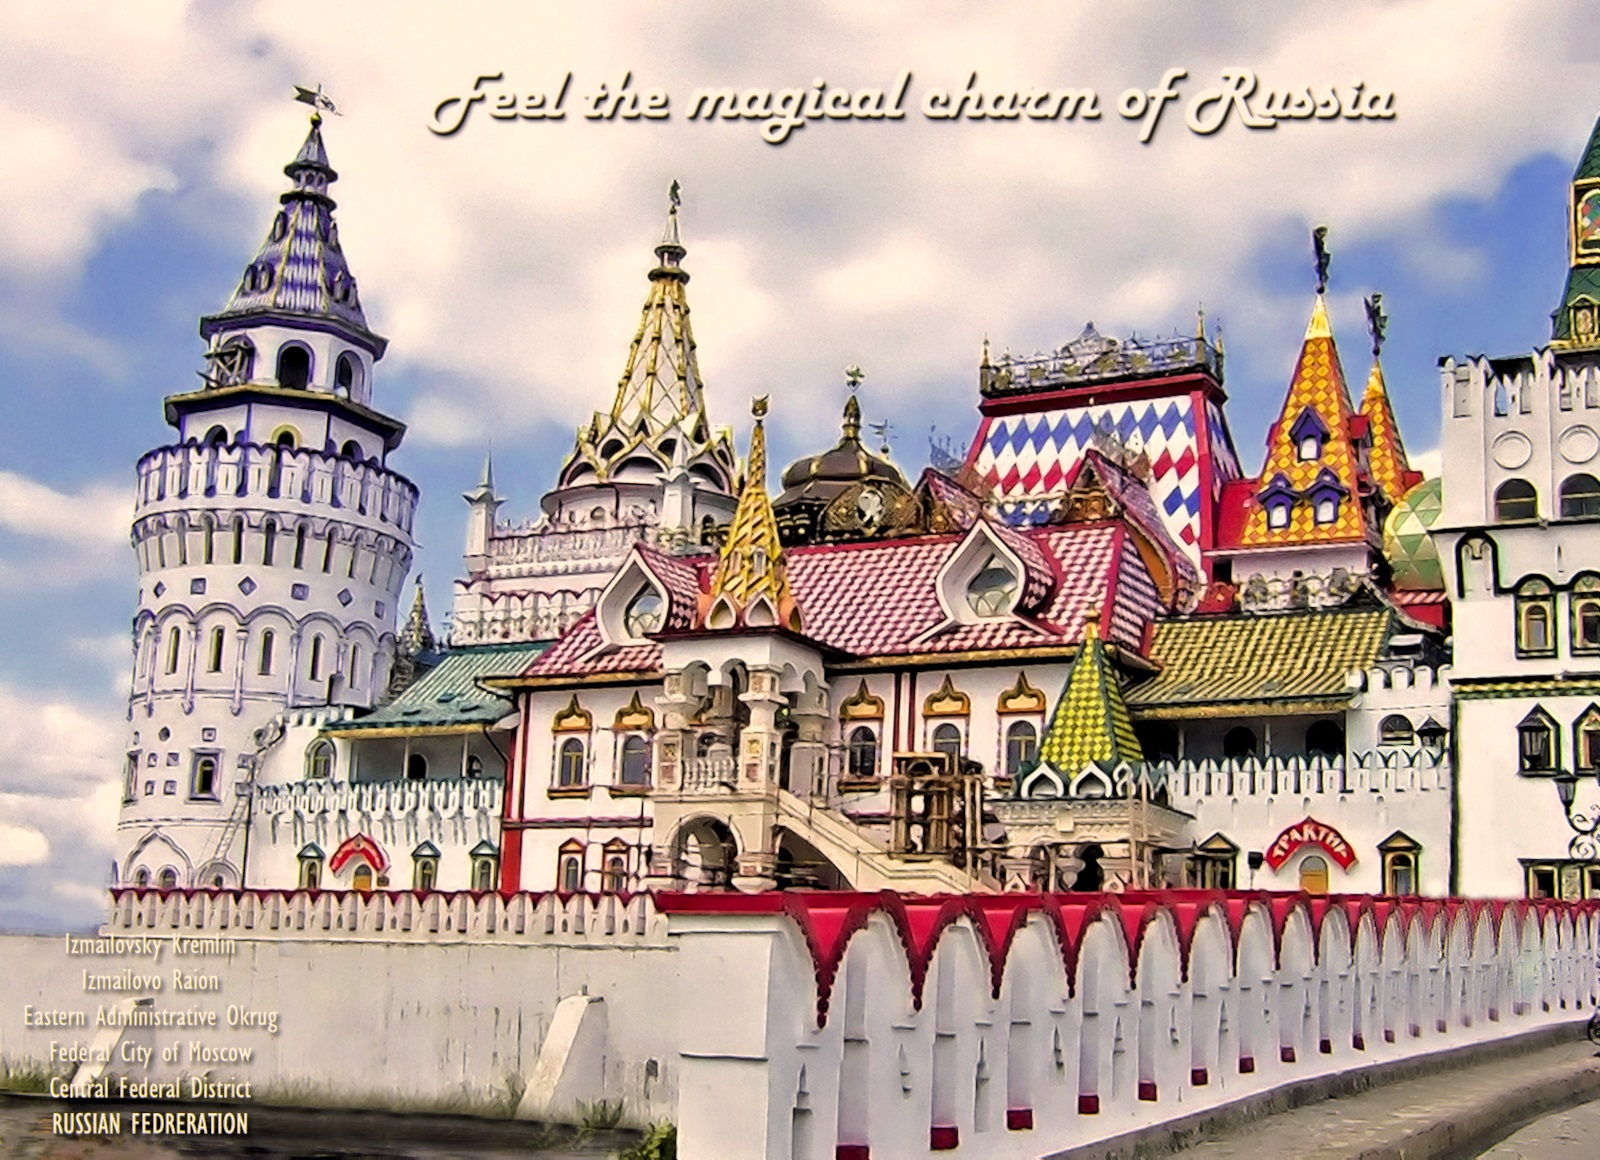 00 feel the magic of russia Izmailovsky Kremlin Moscow 100416